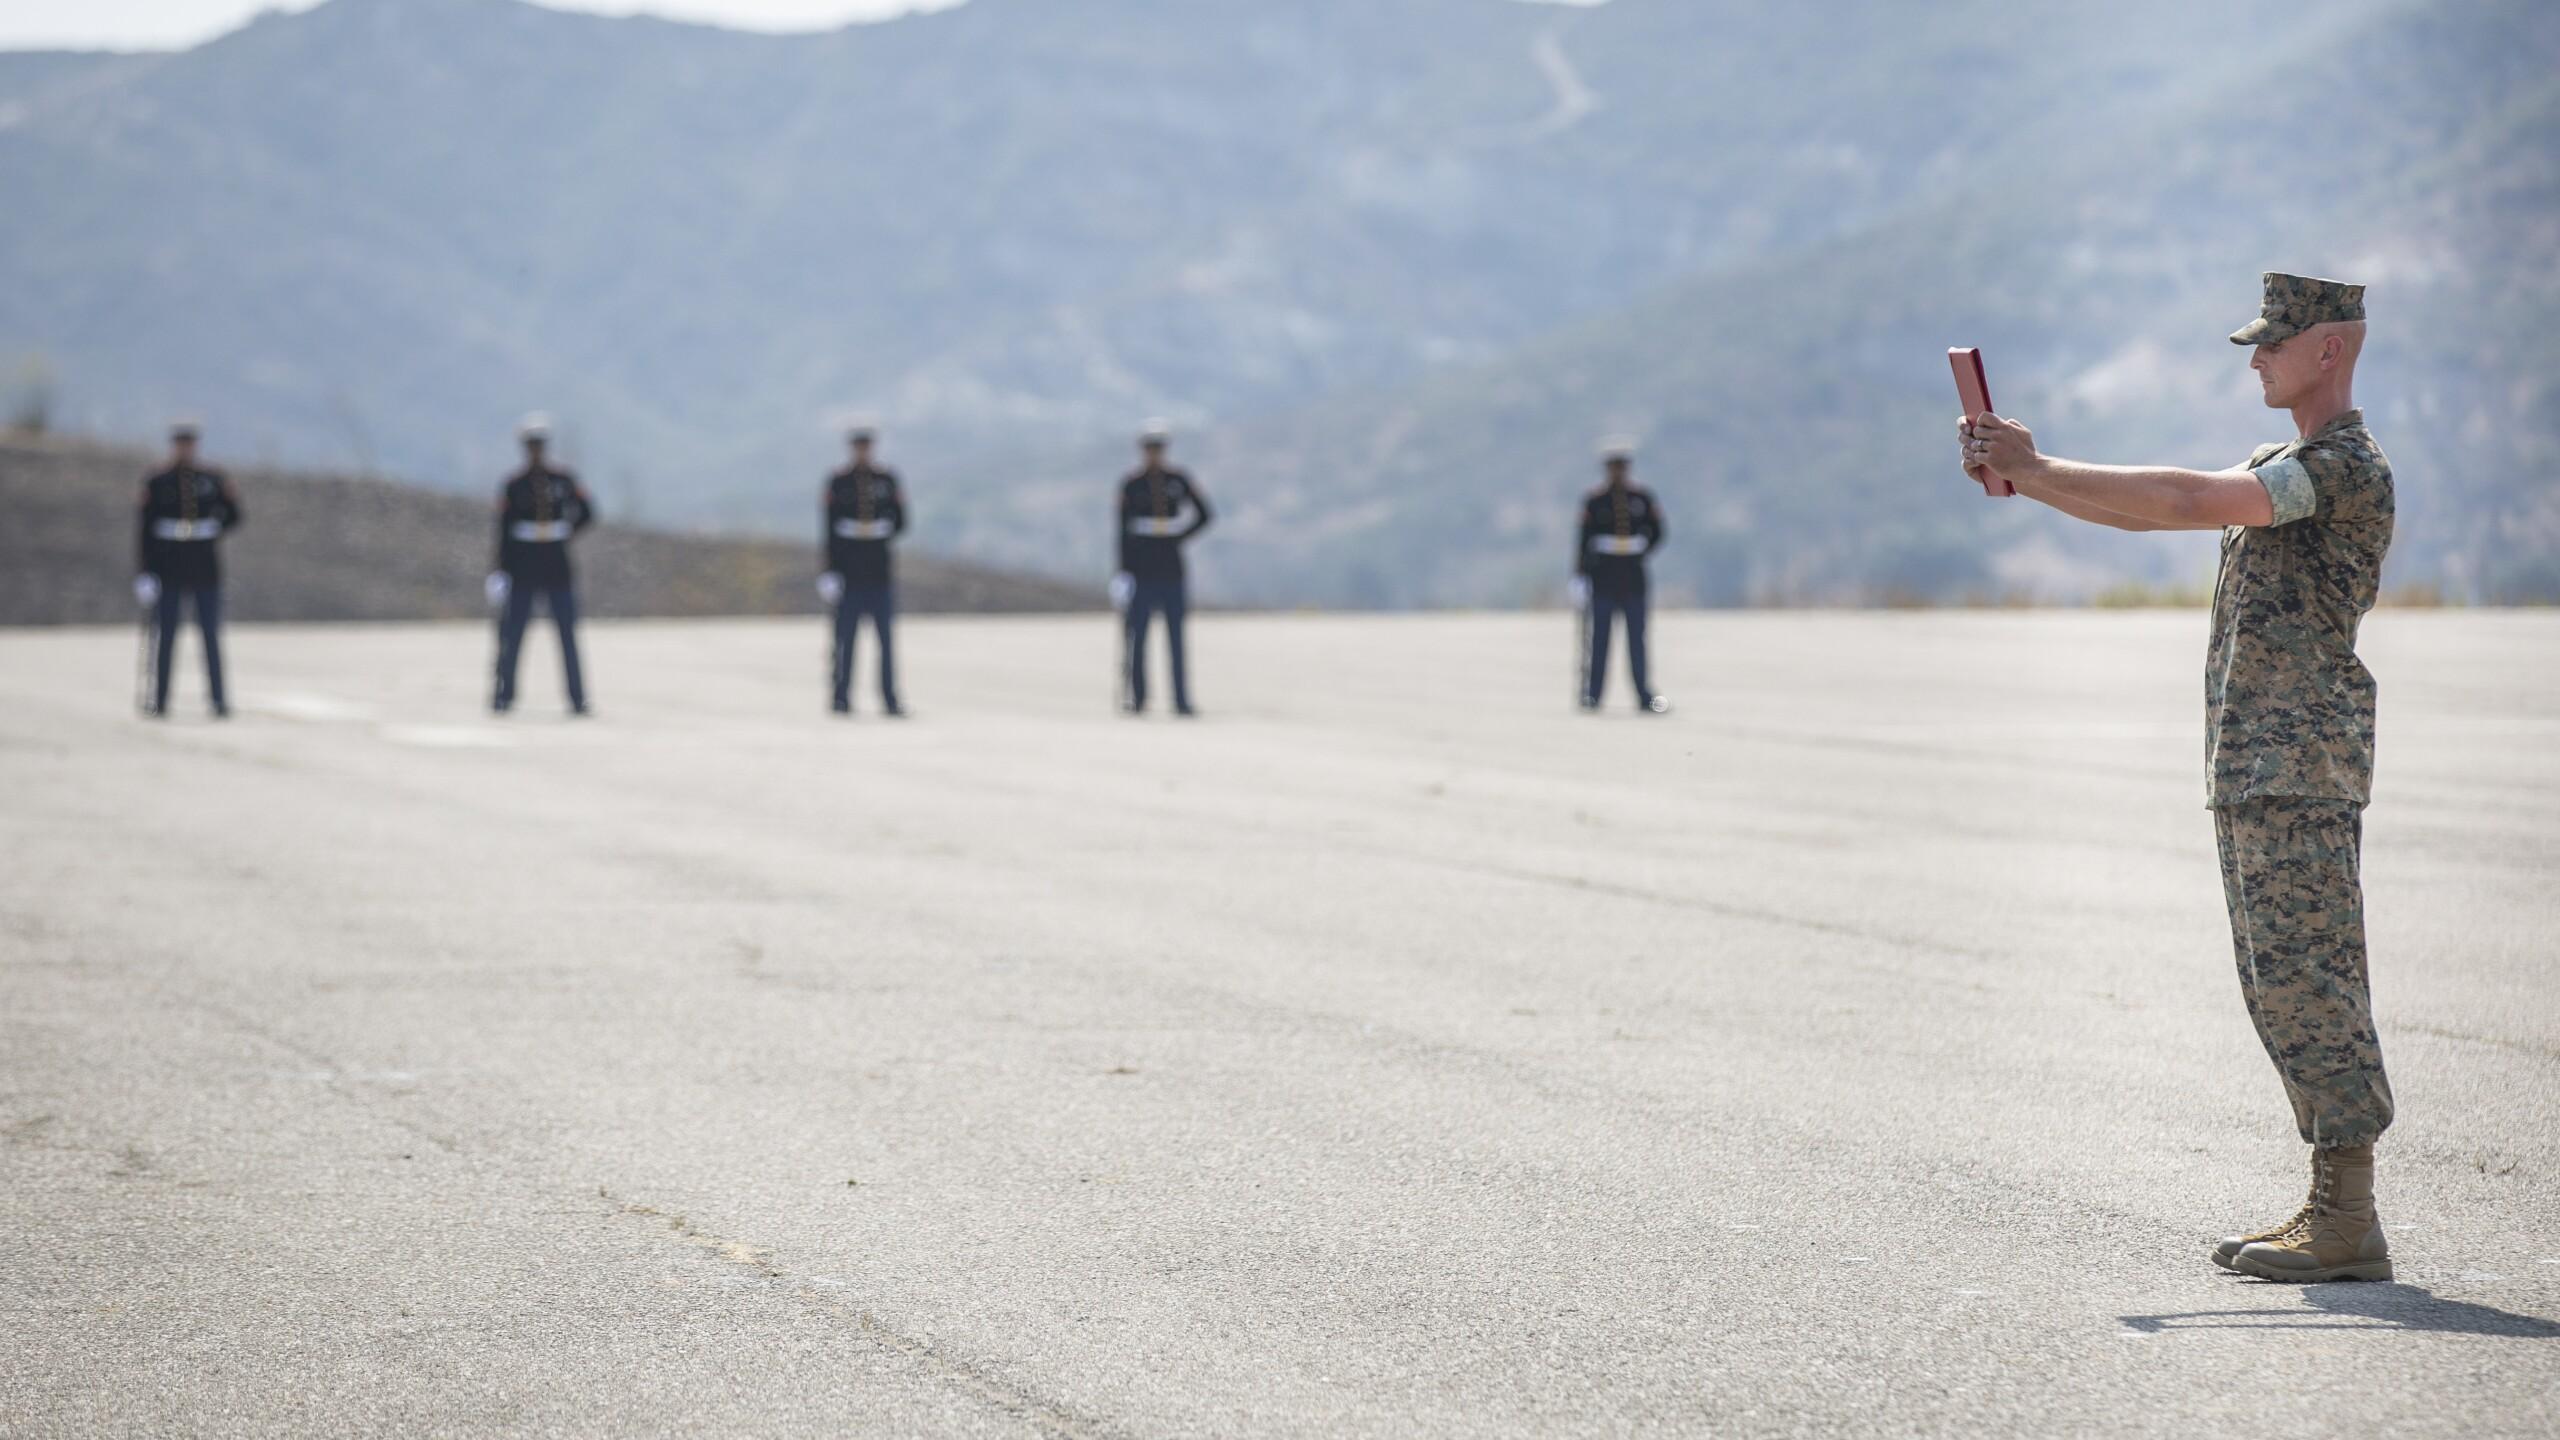 Memorial service honors Marines, sailor killed in training mishap